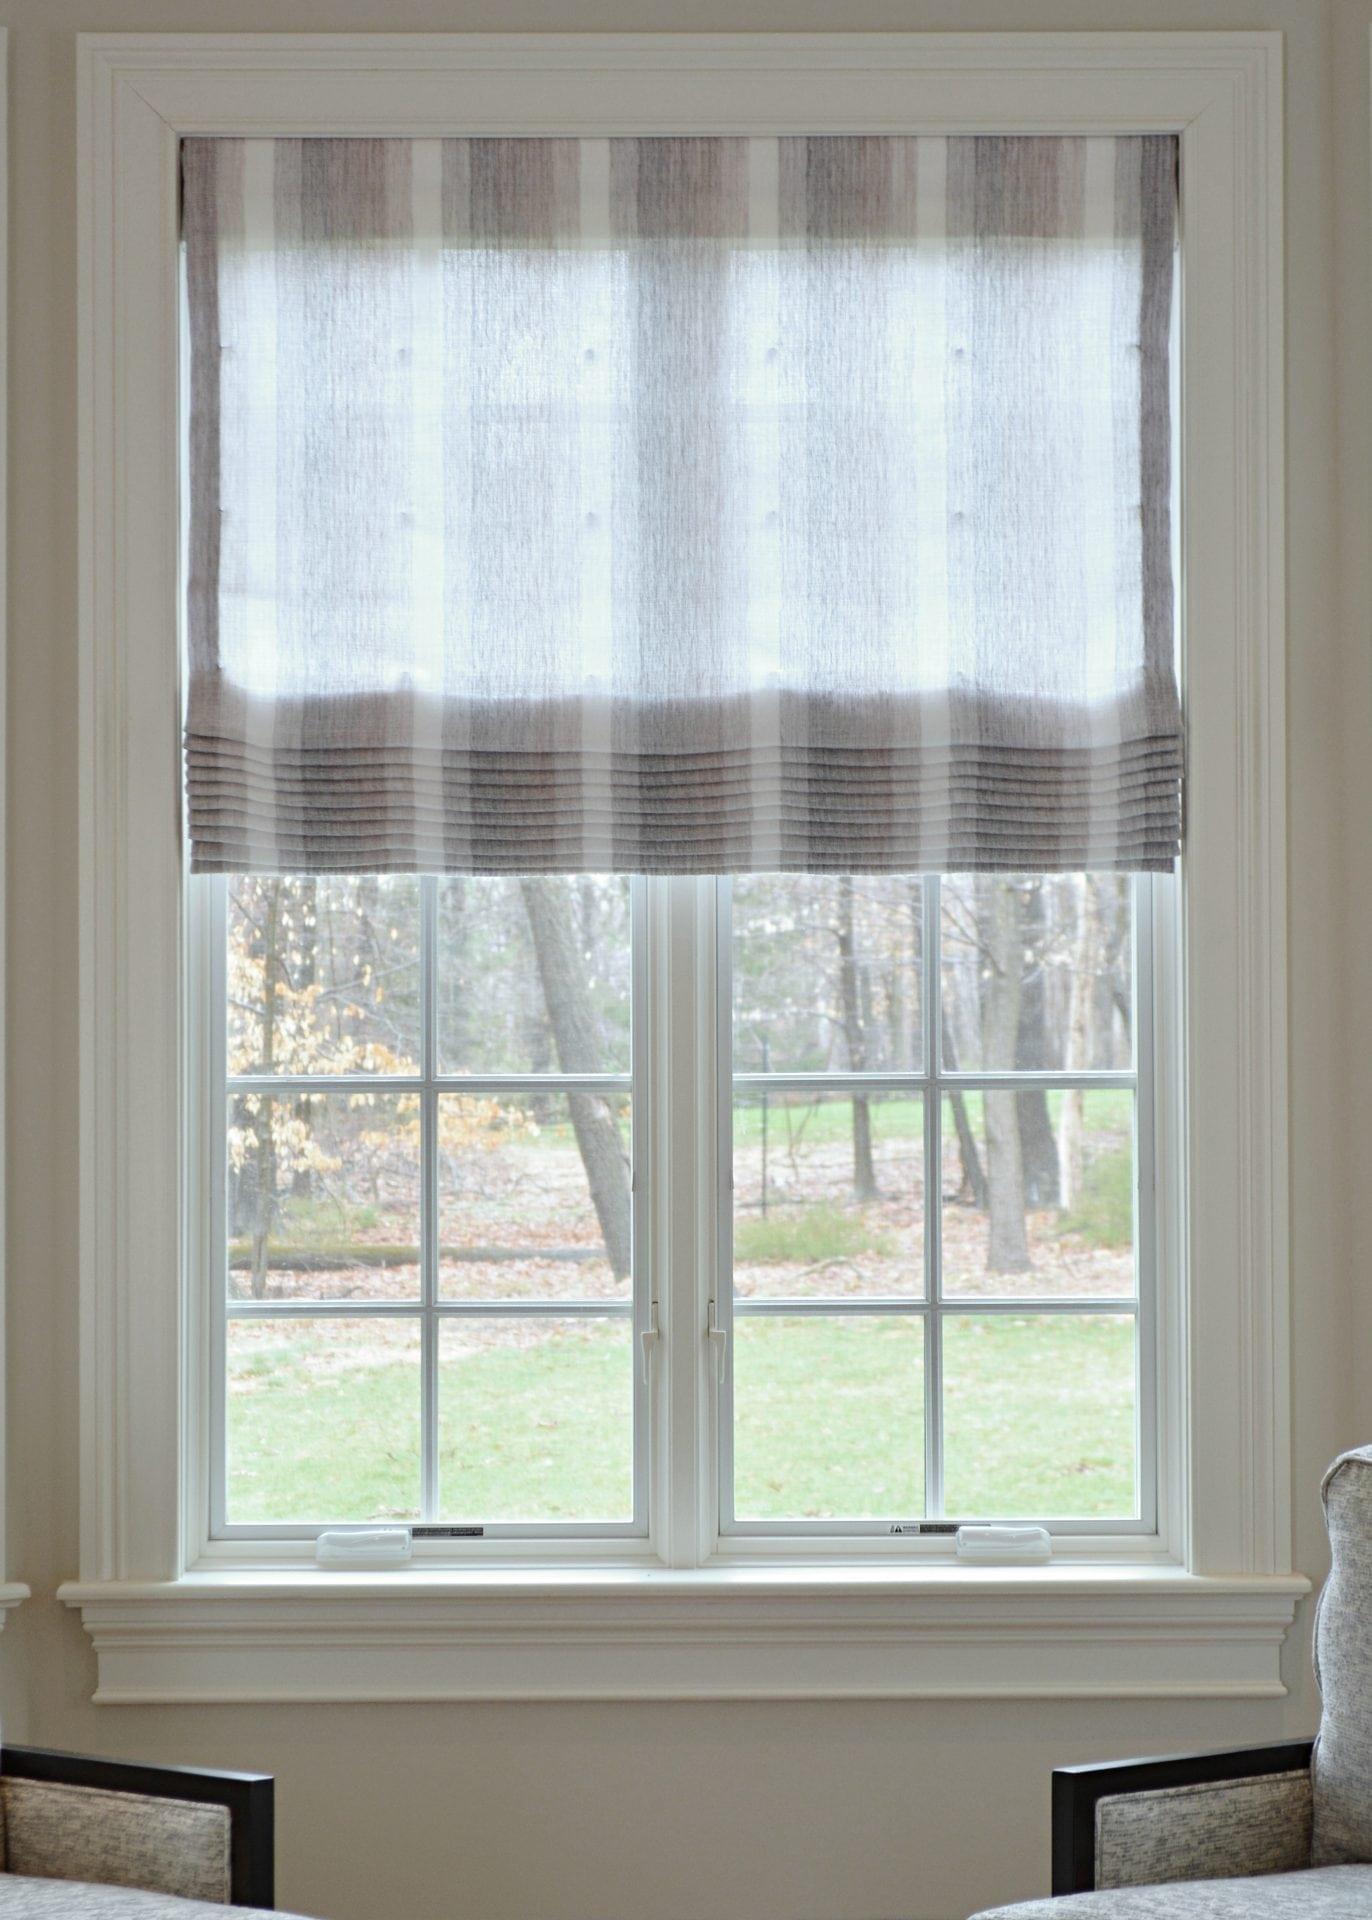 munro grey roman shade willowbloomhome. Black Bedroom Furniture Sets. Home Design Ideas